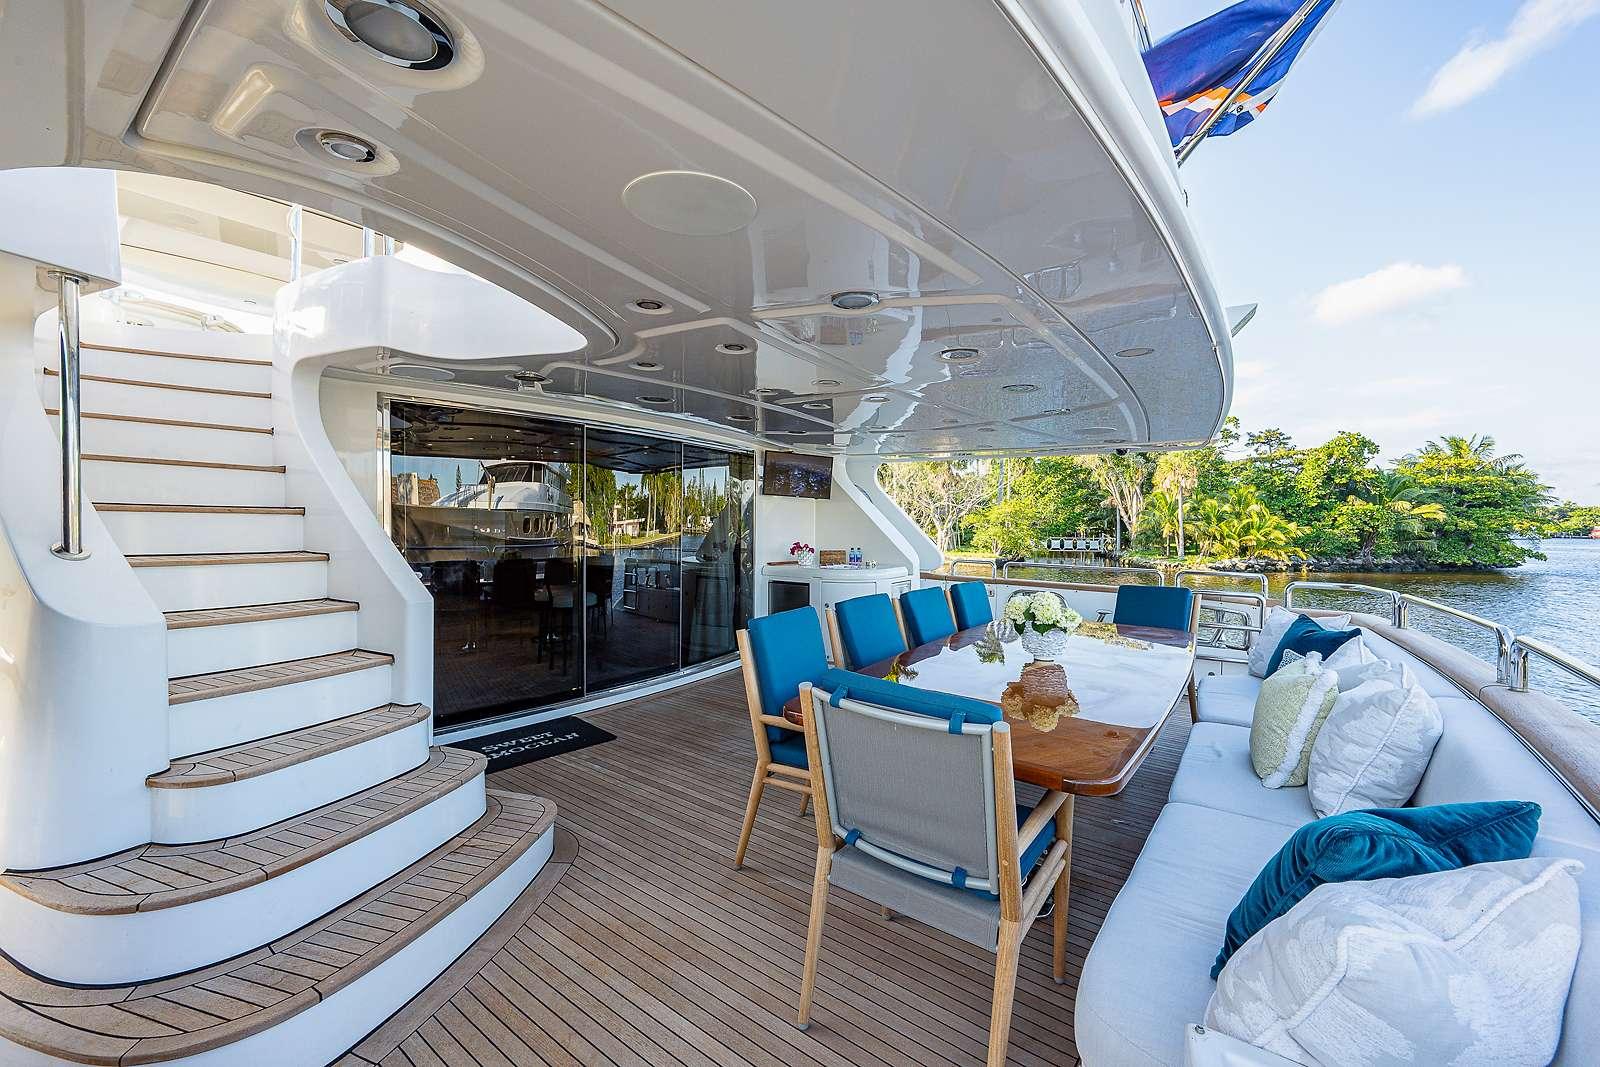 Image of Sweet Emocean yacht #10